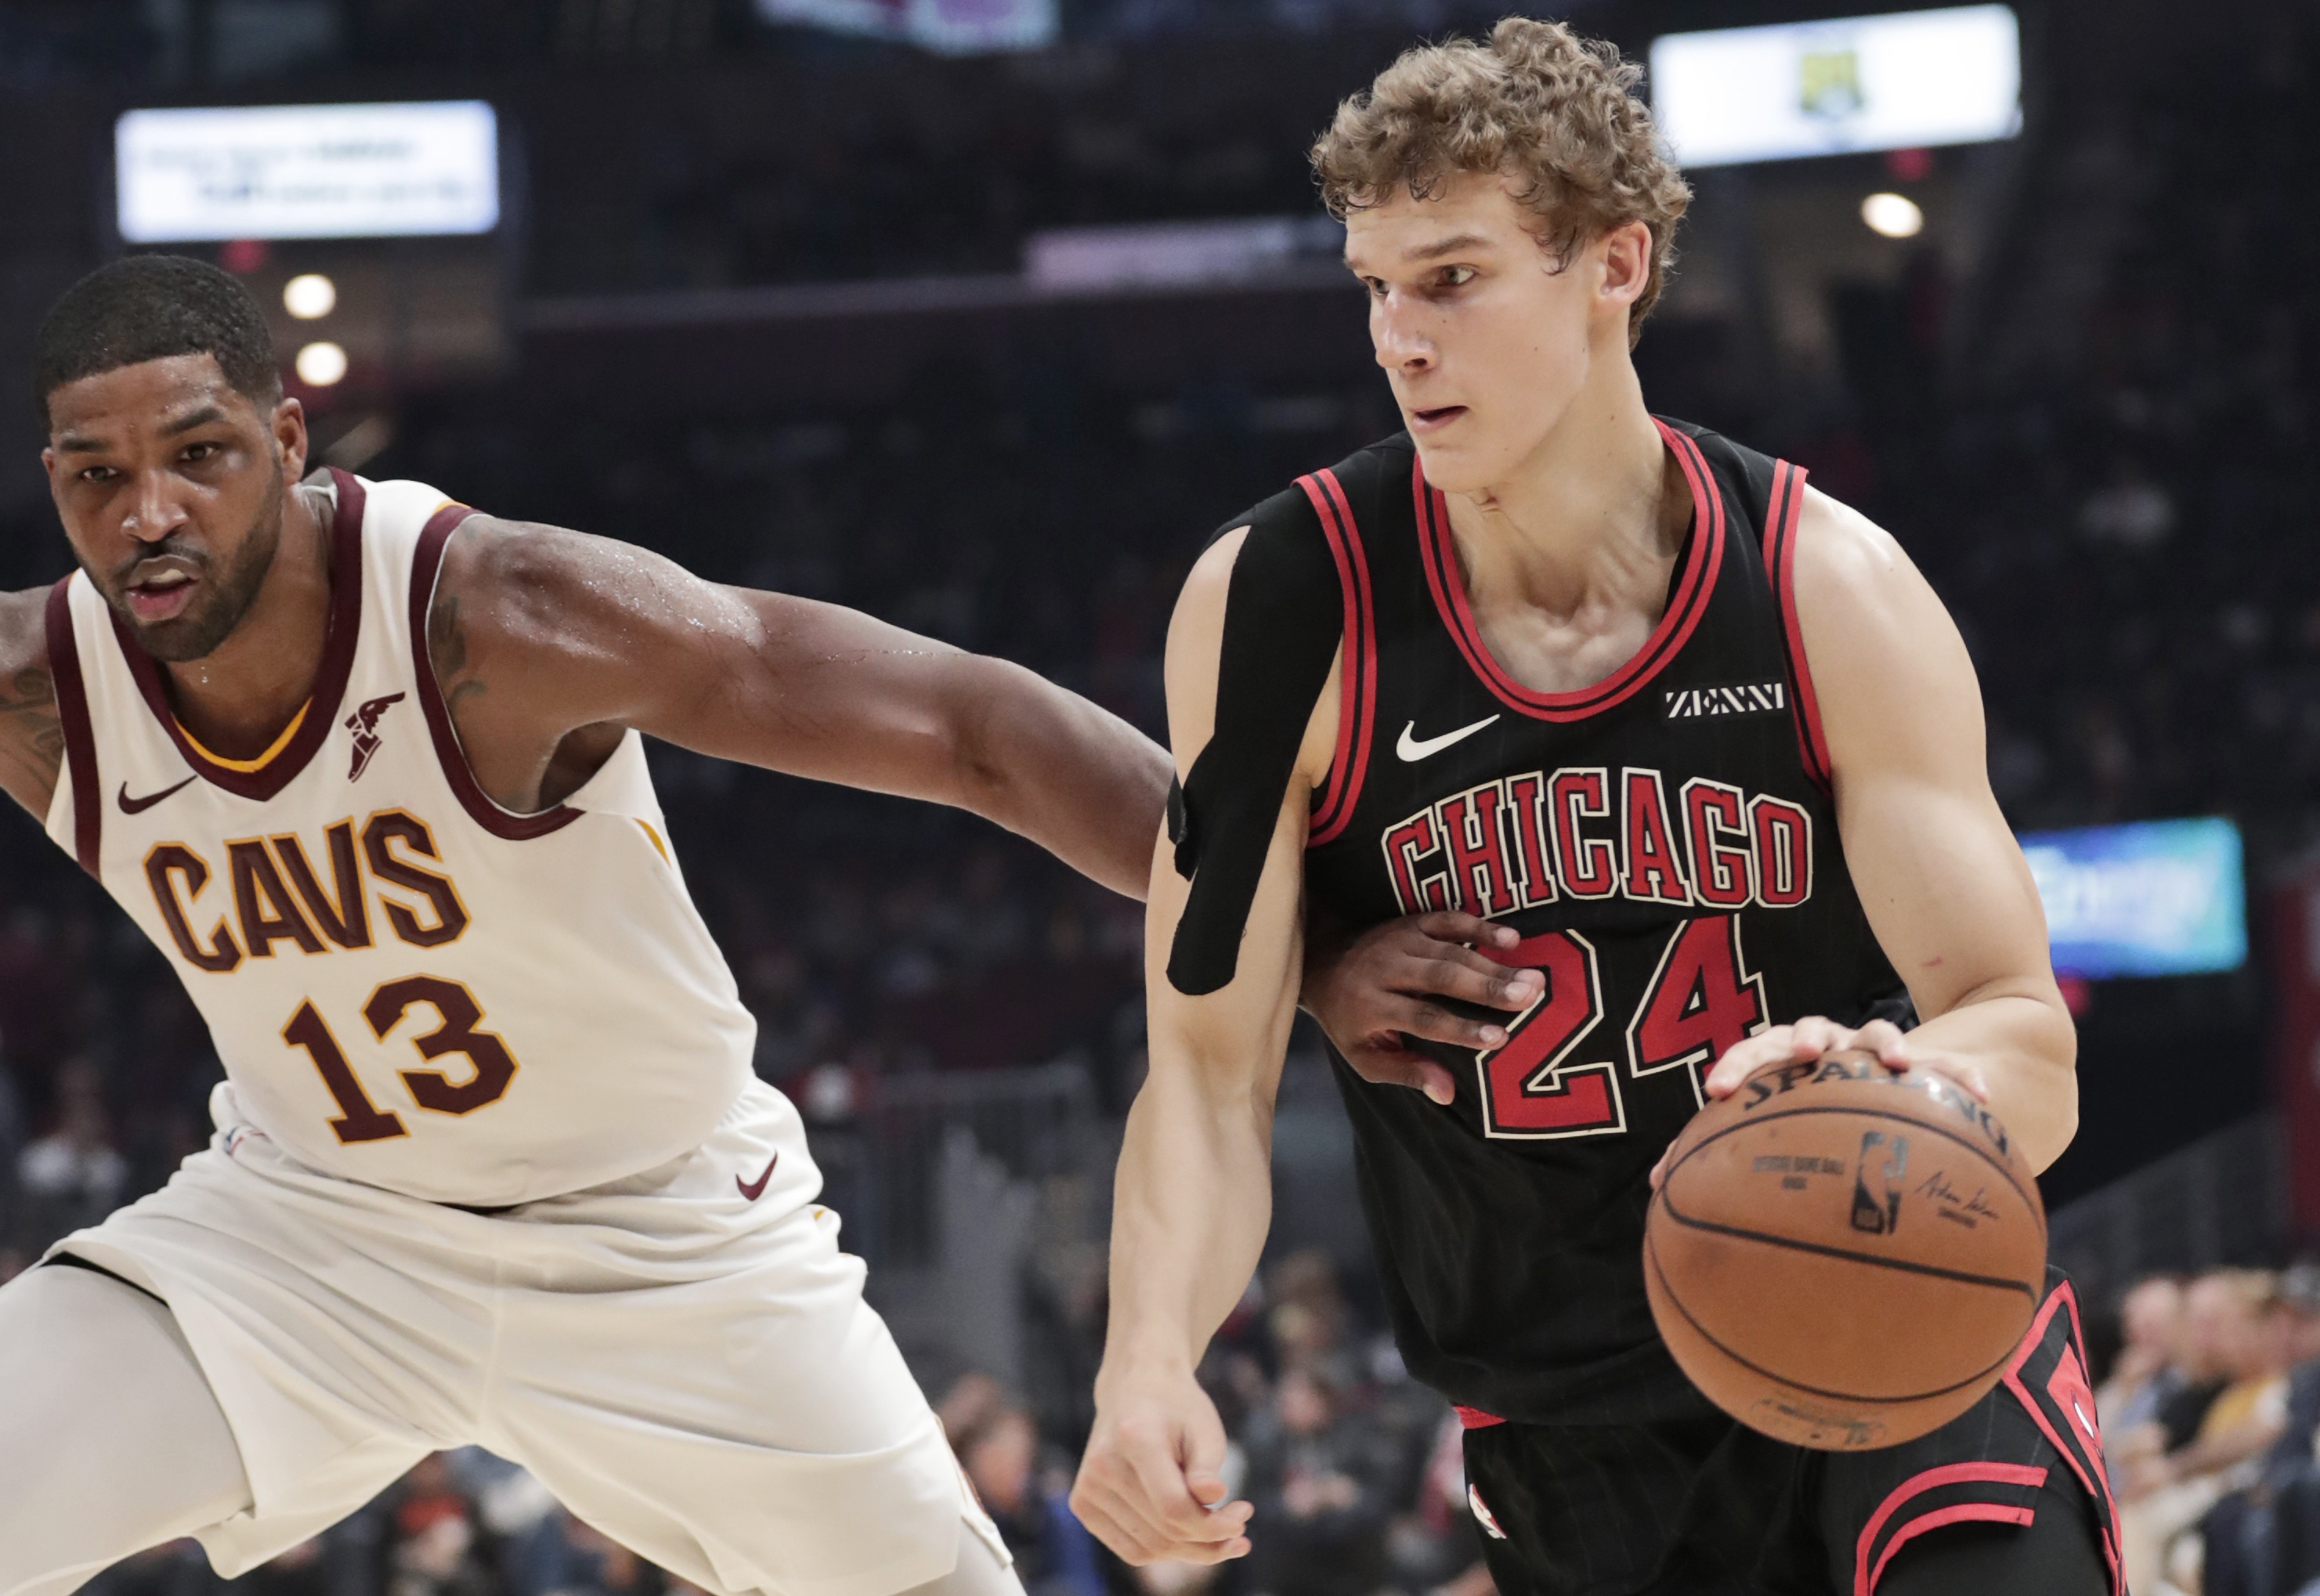 The Bulls' Lauri Markkanen drives around the Cavaliers' Tristan Thompson Wednesday night in Cleveland.